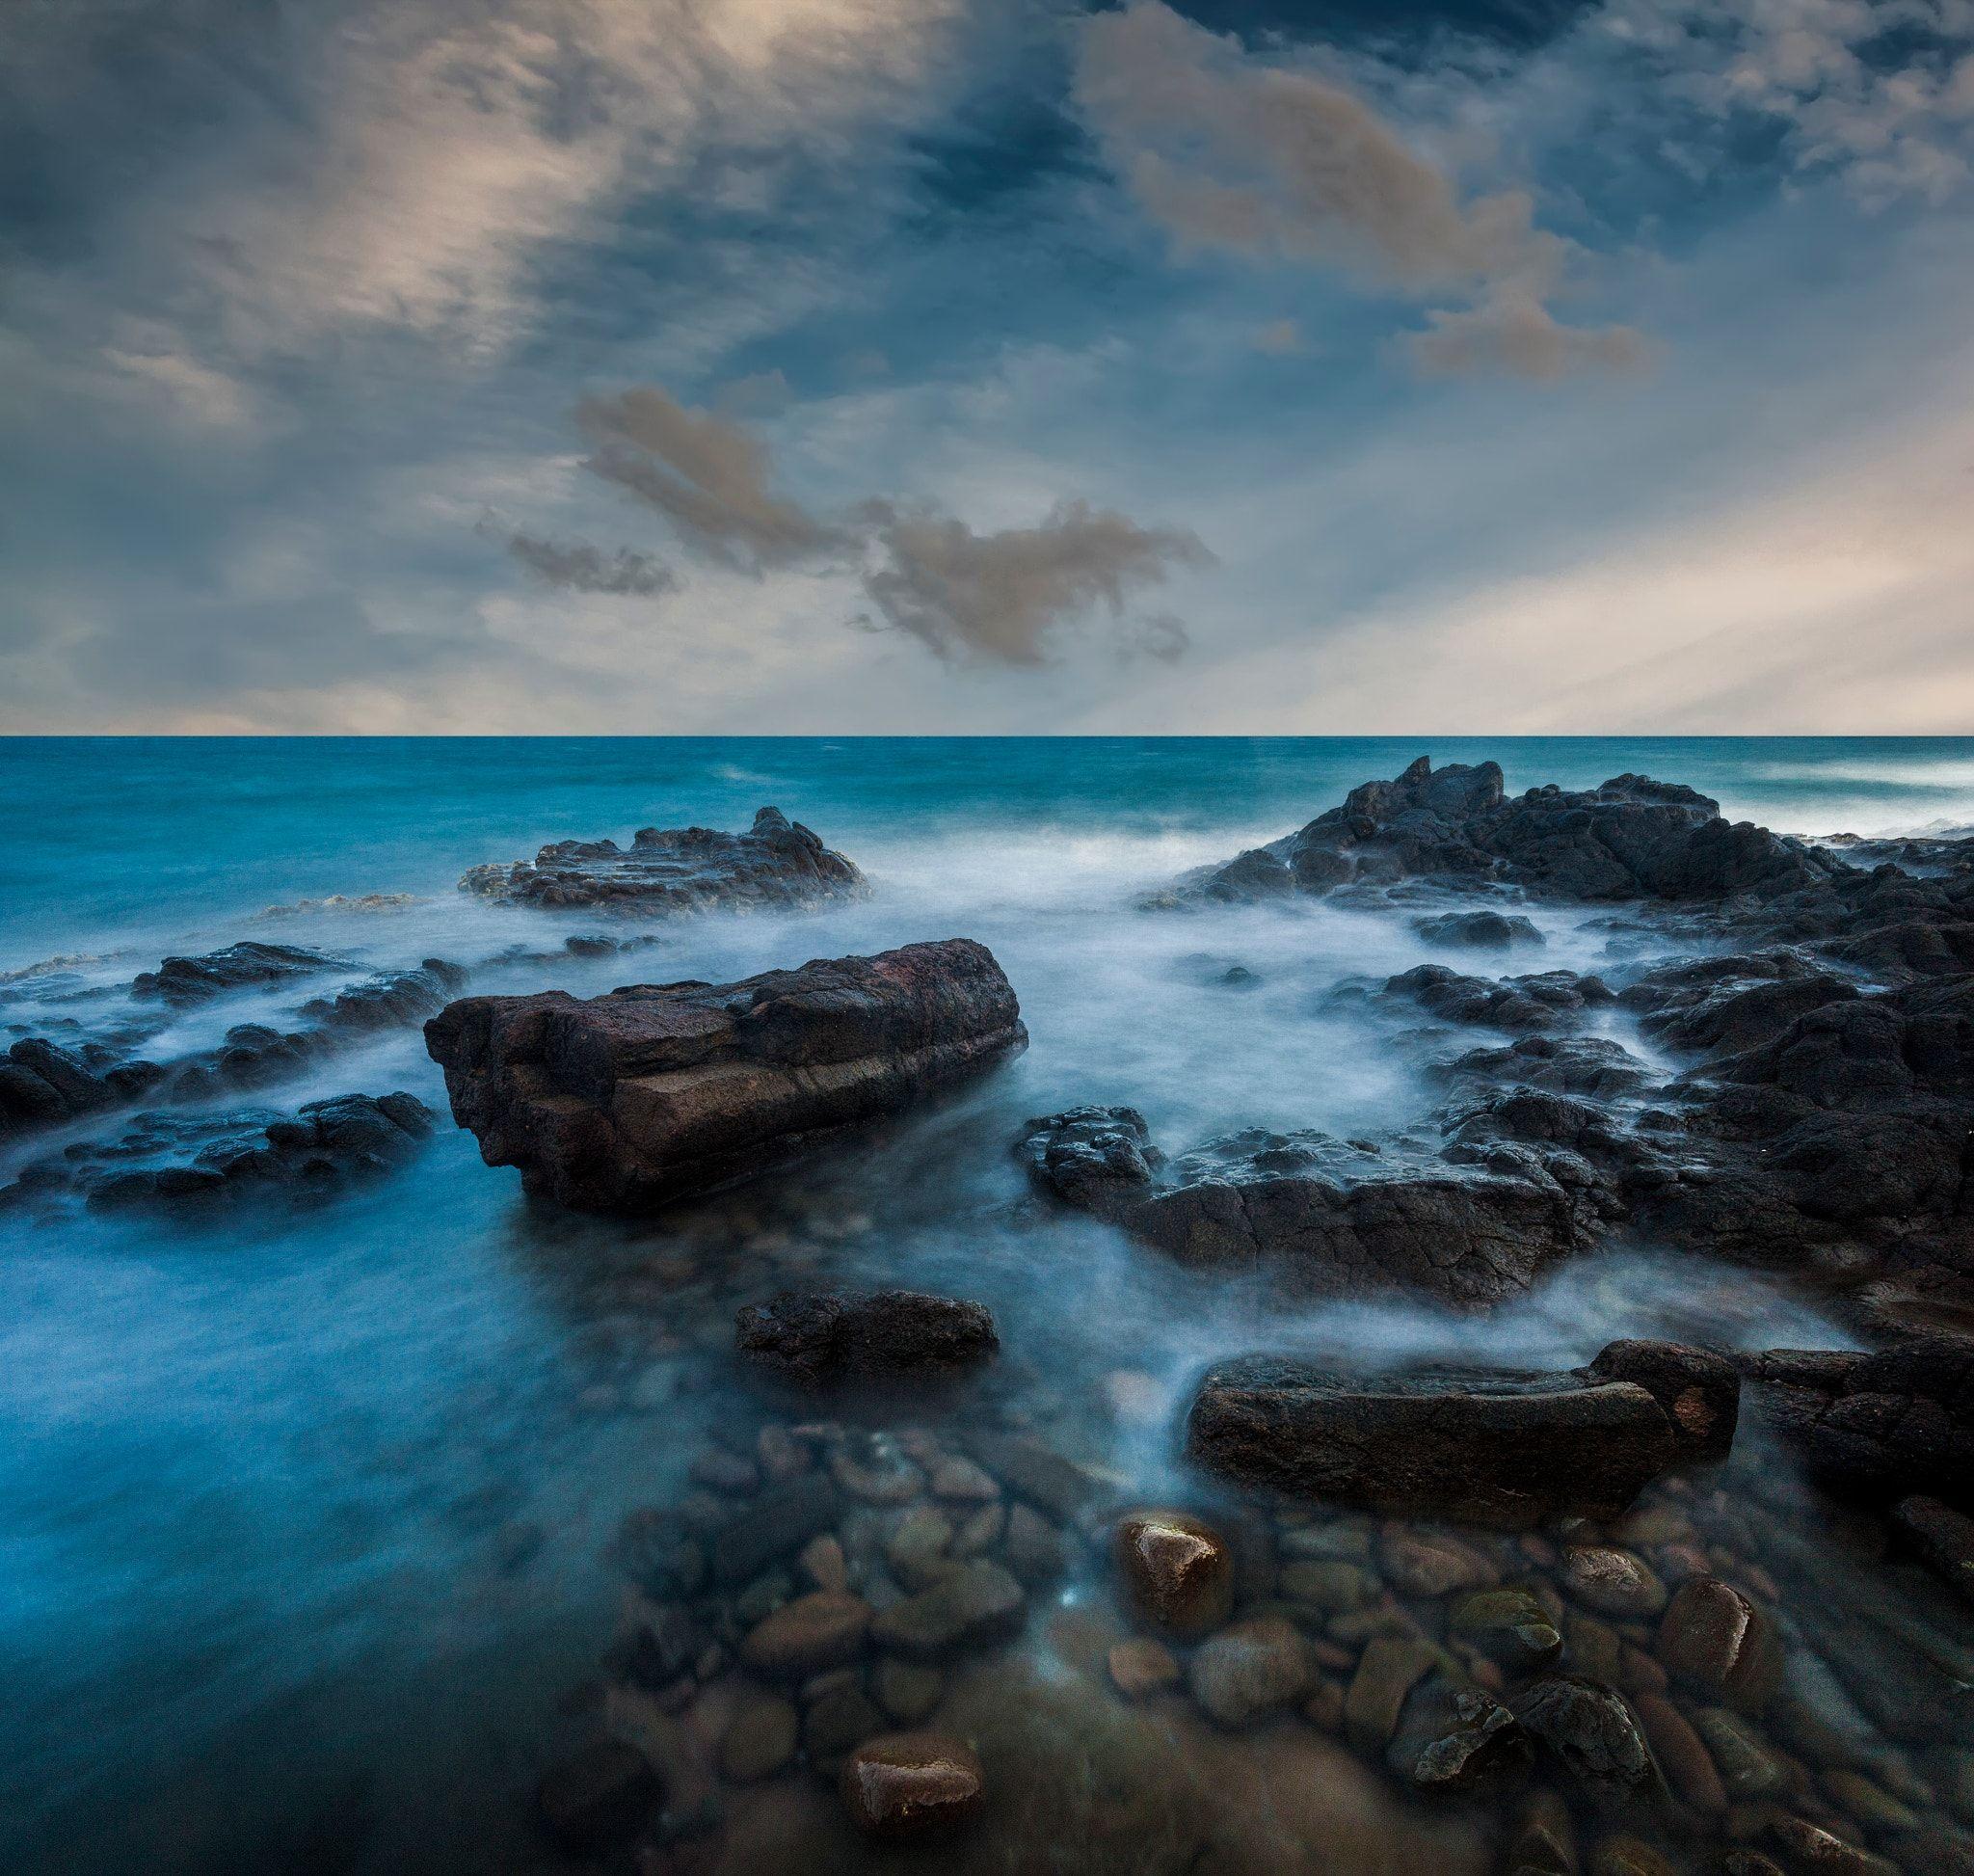 Cape of Gata - Sunset photography